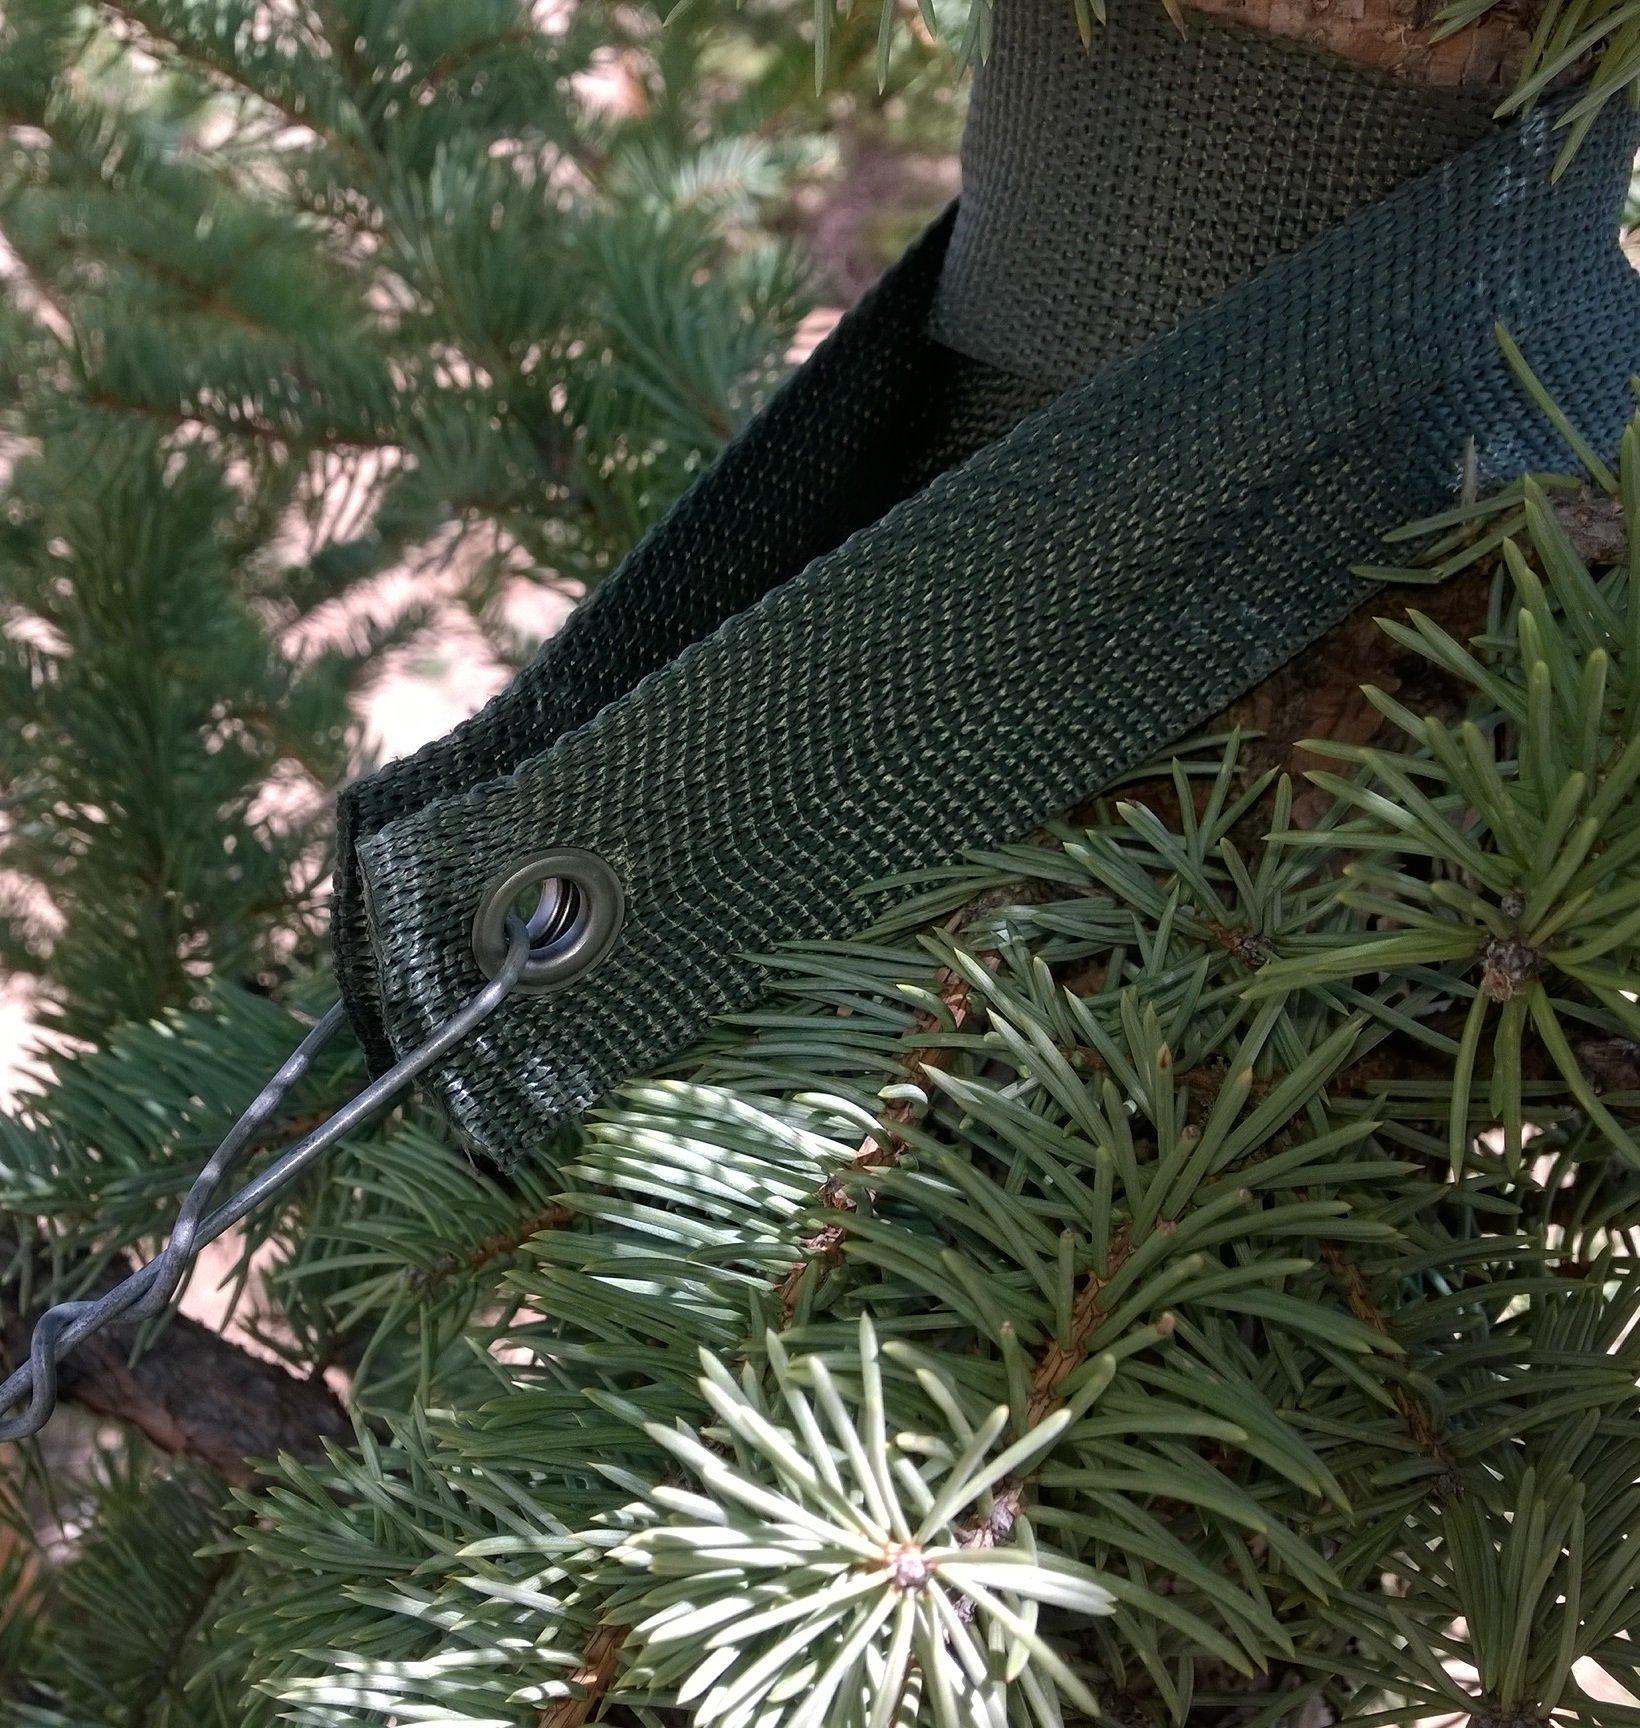 HORT Tree Straps 6-PACK 12'', Commercial Grade by HORT